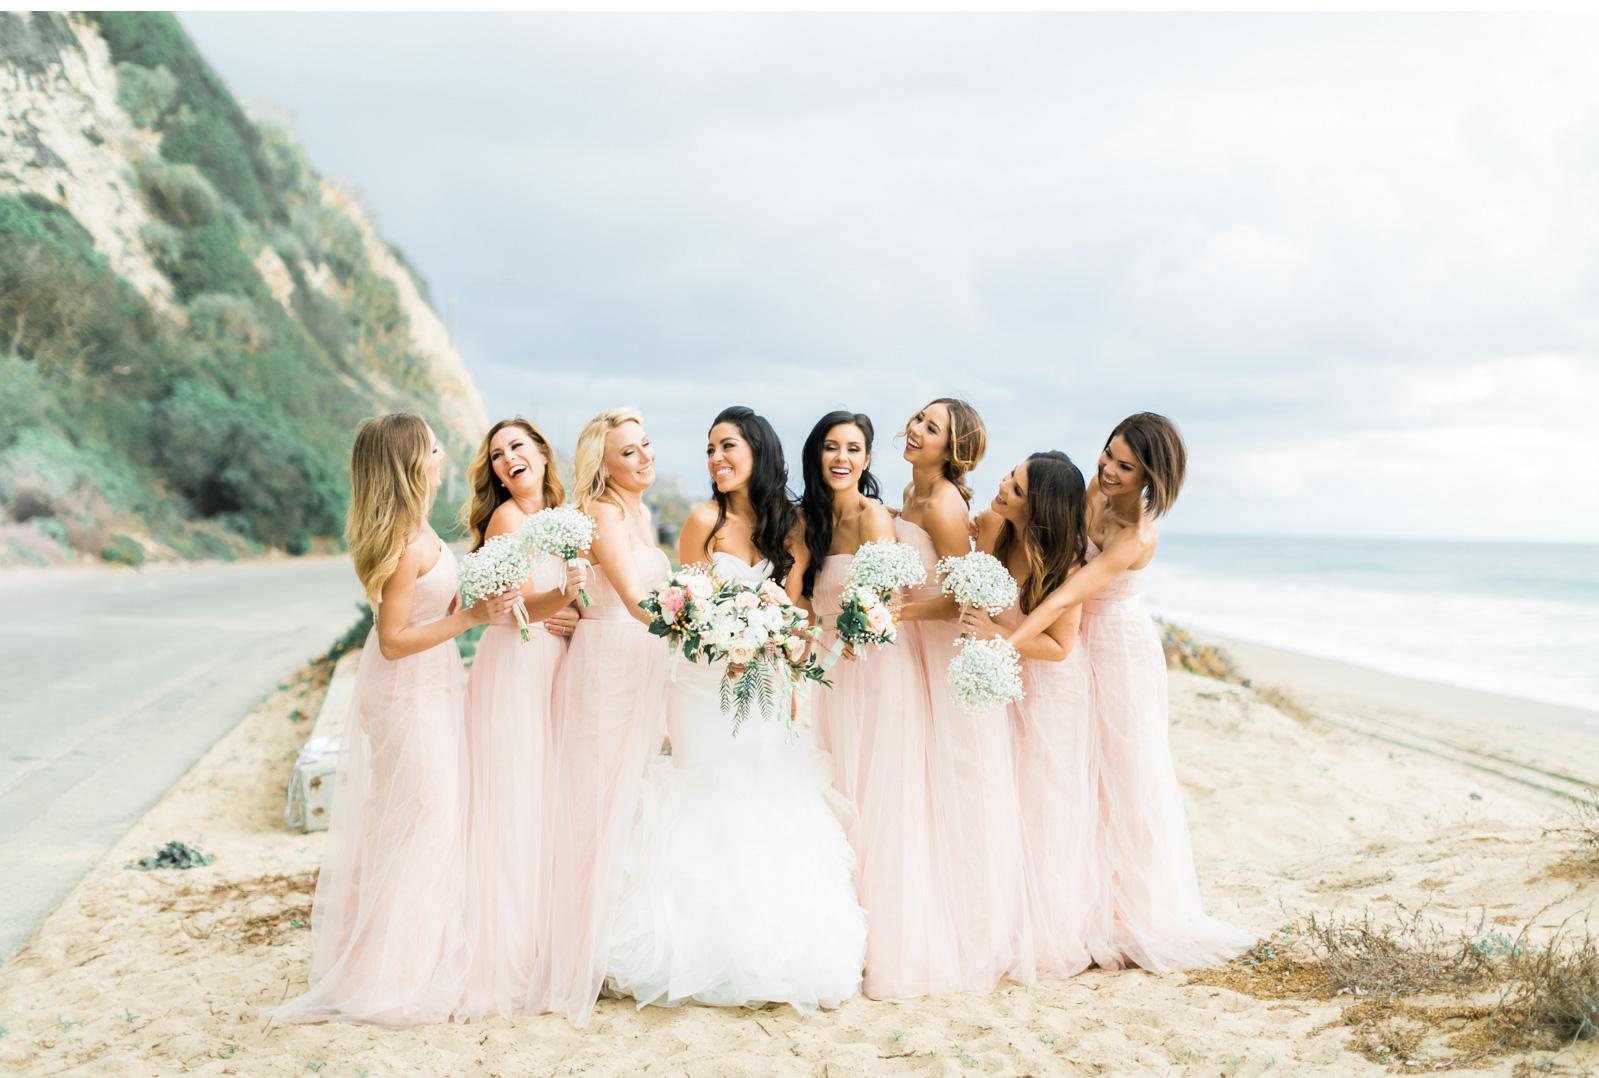 Rod-and-Lorin-Brewster-Style-Me-Pretty-Malibu-Beach-Wedding-Natalie-Schutt-Photography_07.jpg